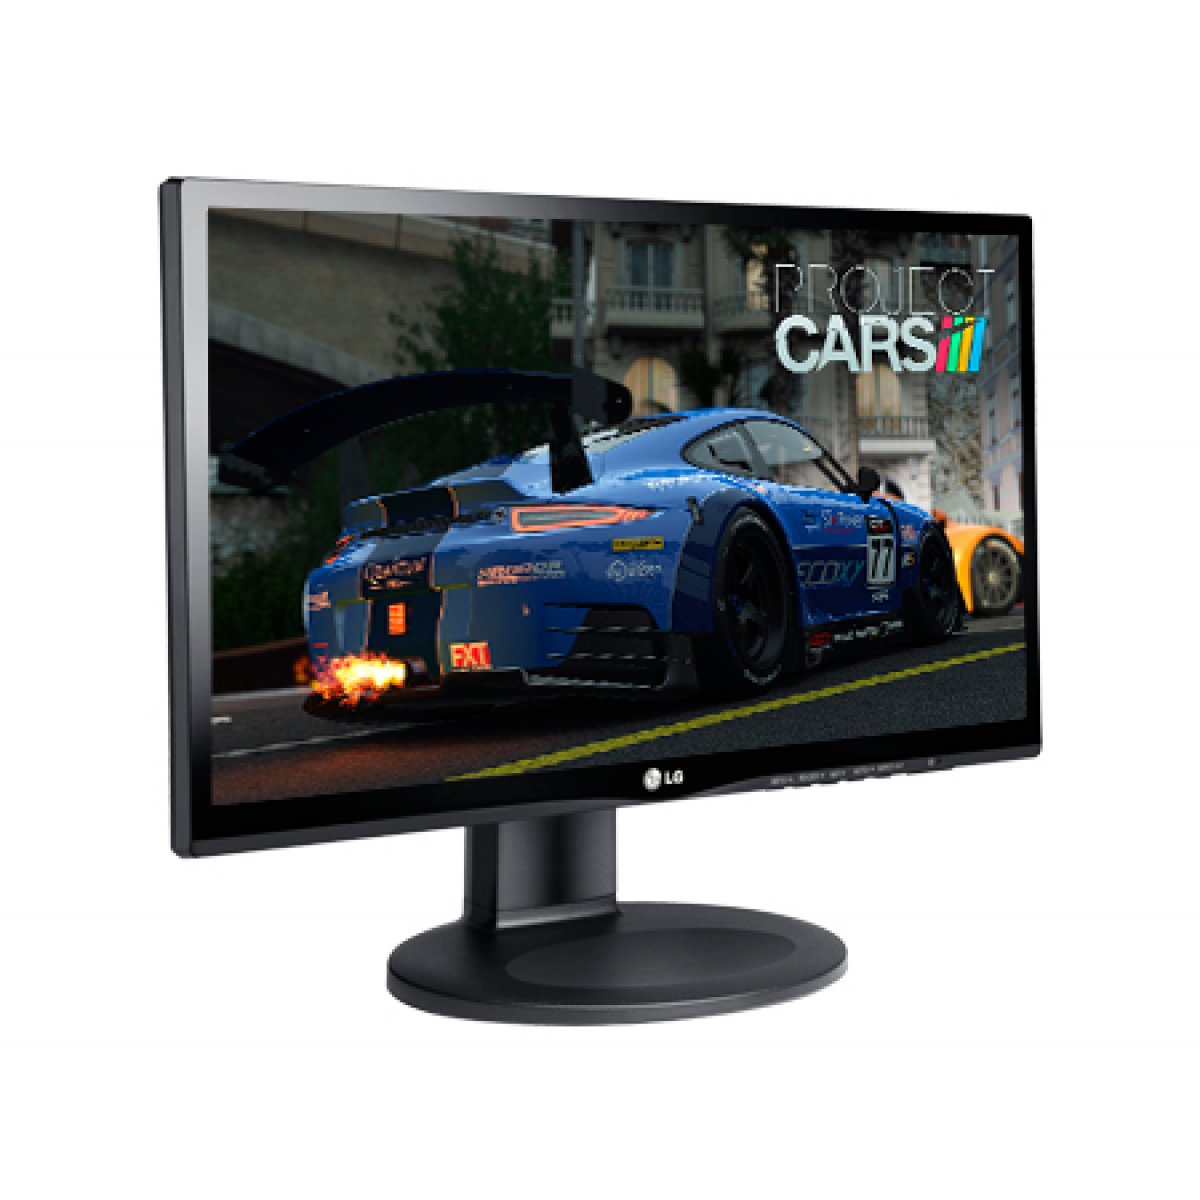 Monitor Gamer LG 21.5 Pol, Full HD, 22MP55VQ